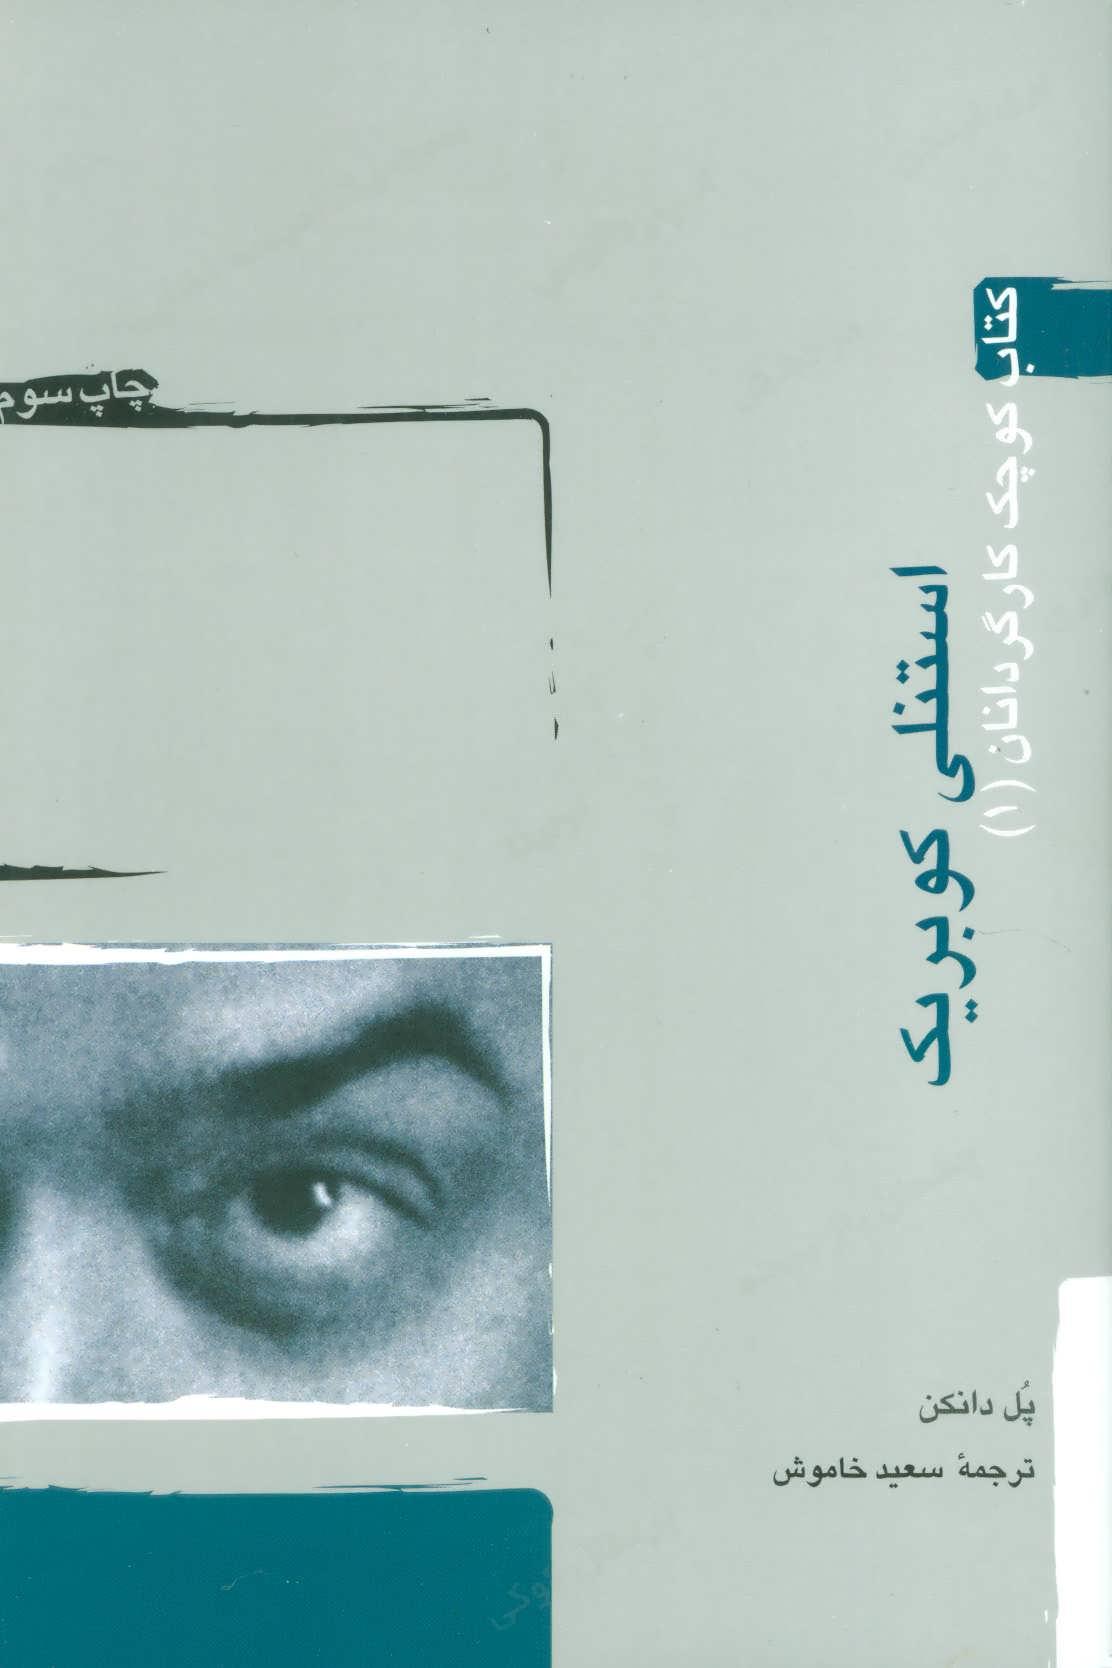 استنلی کوبریک (کتاب کوچک کارگردانان 1)